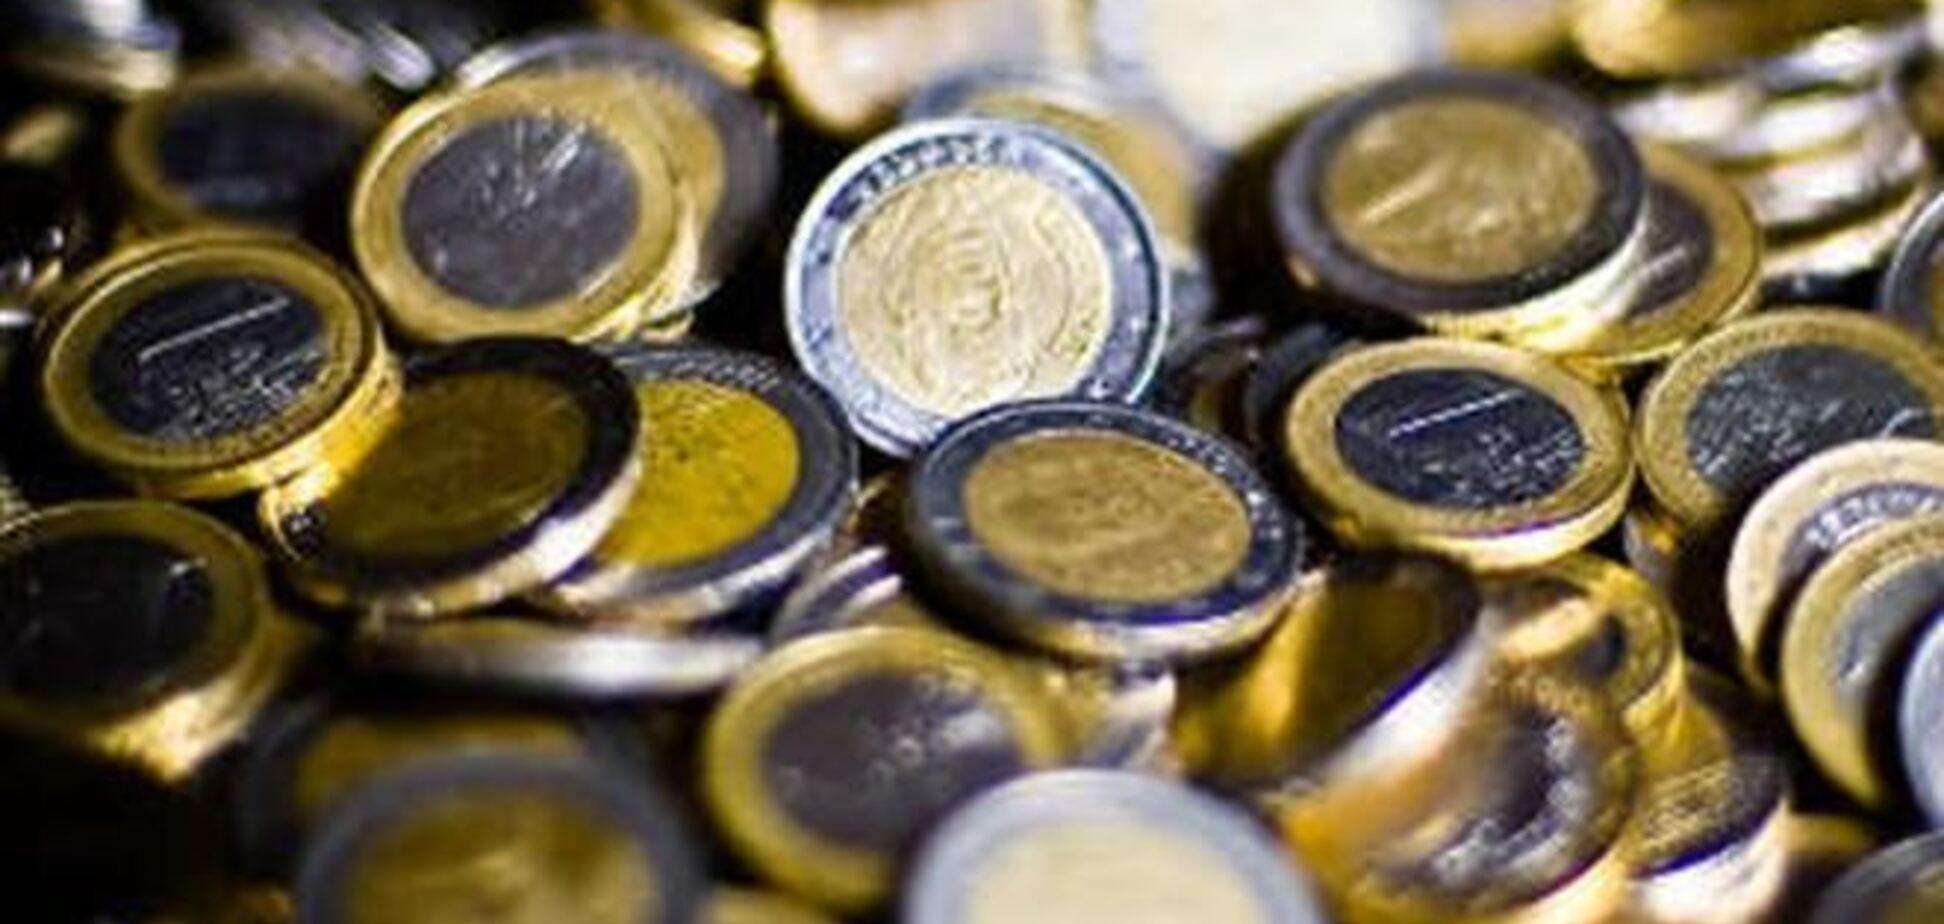 В Париже задержали китайцев с 3700 монетами номиналом в один евро